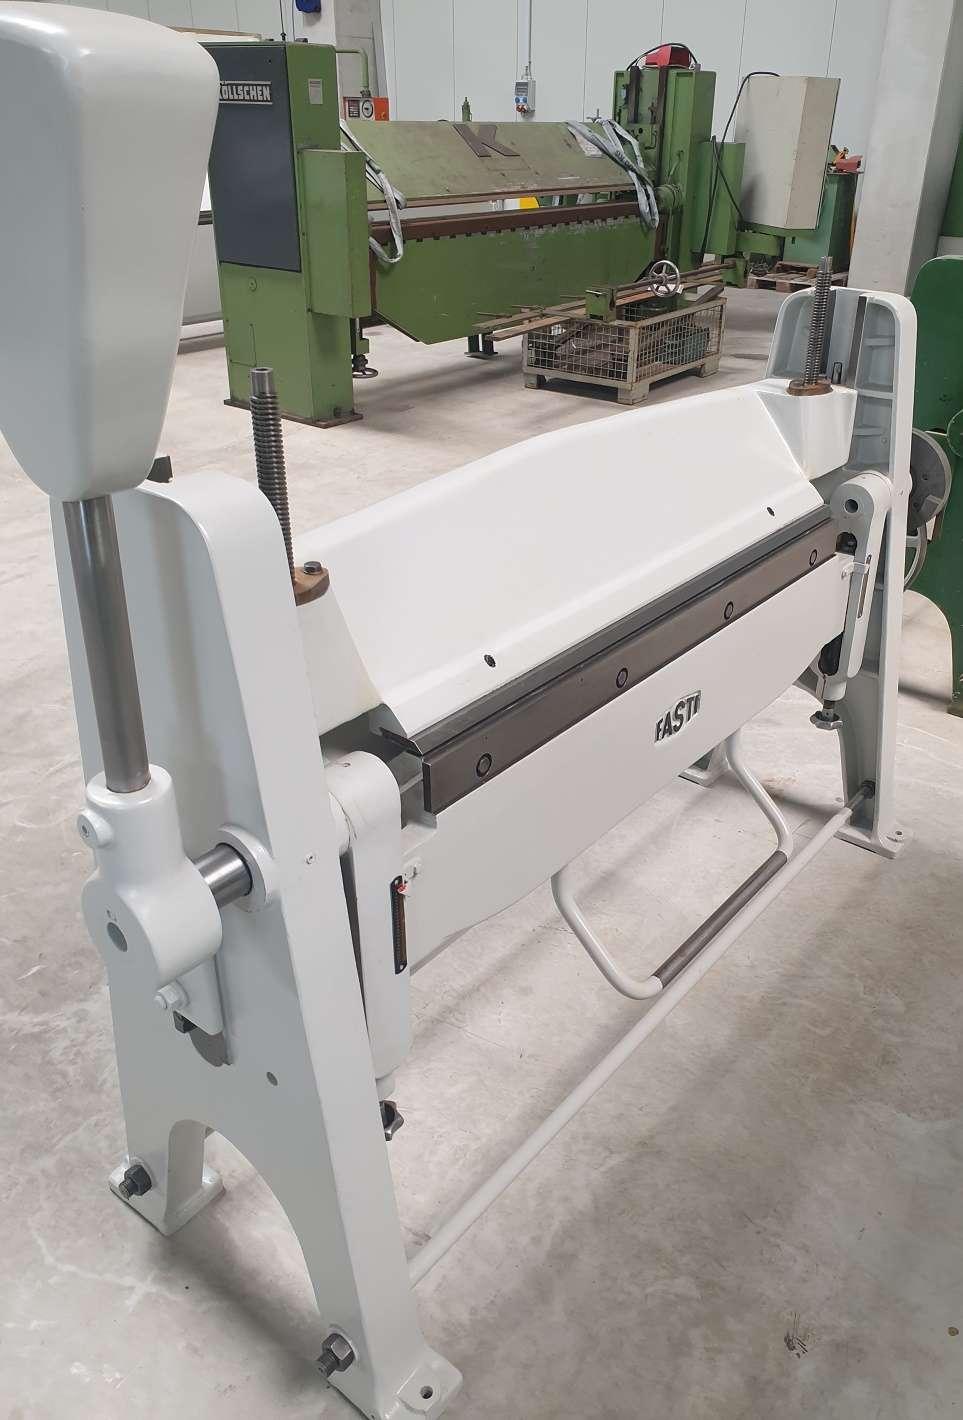 Листогиб с поворотной балкой Fasti 206-12-3 фото на Industry-Pilot